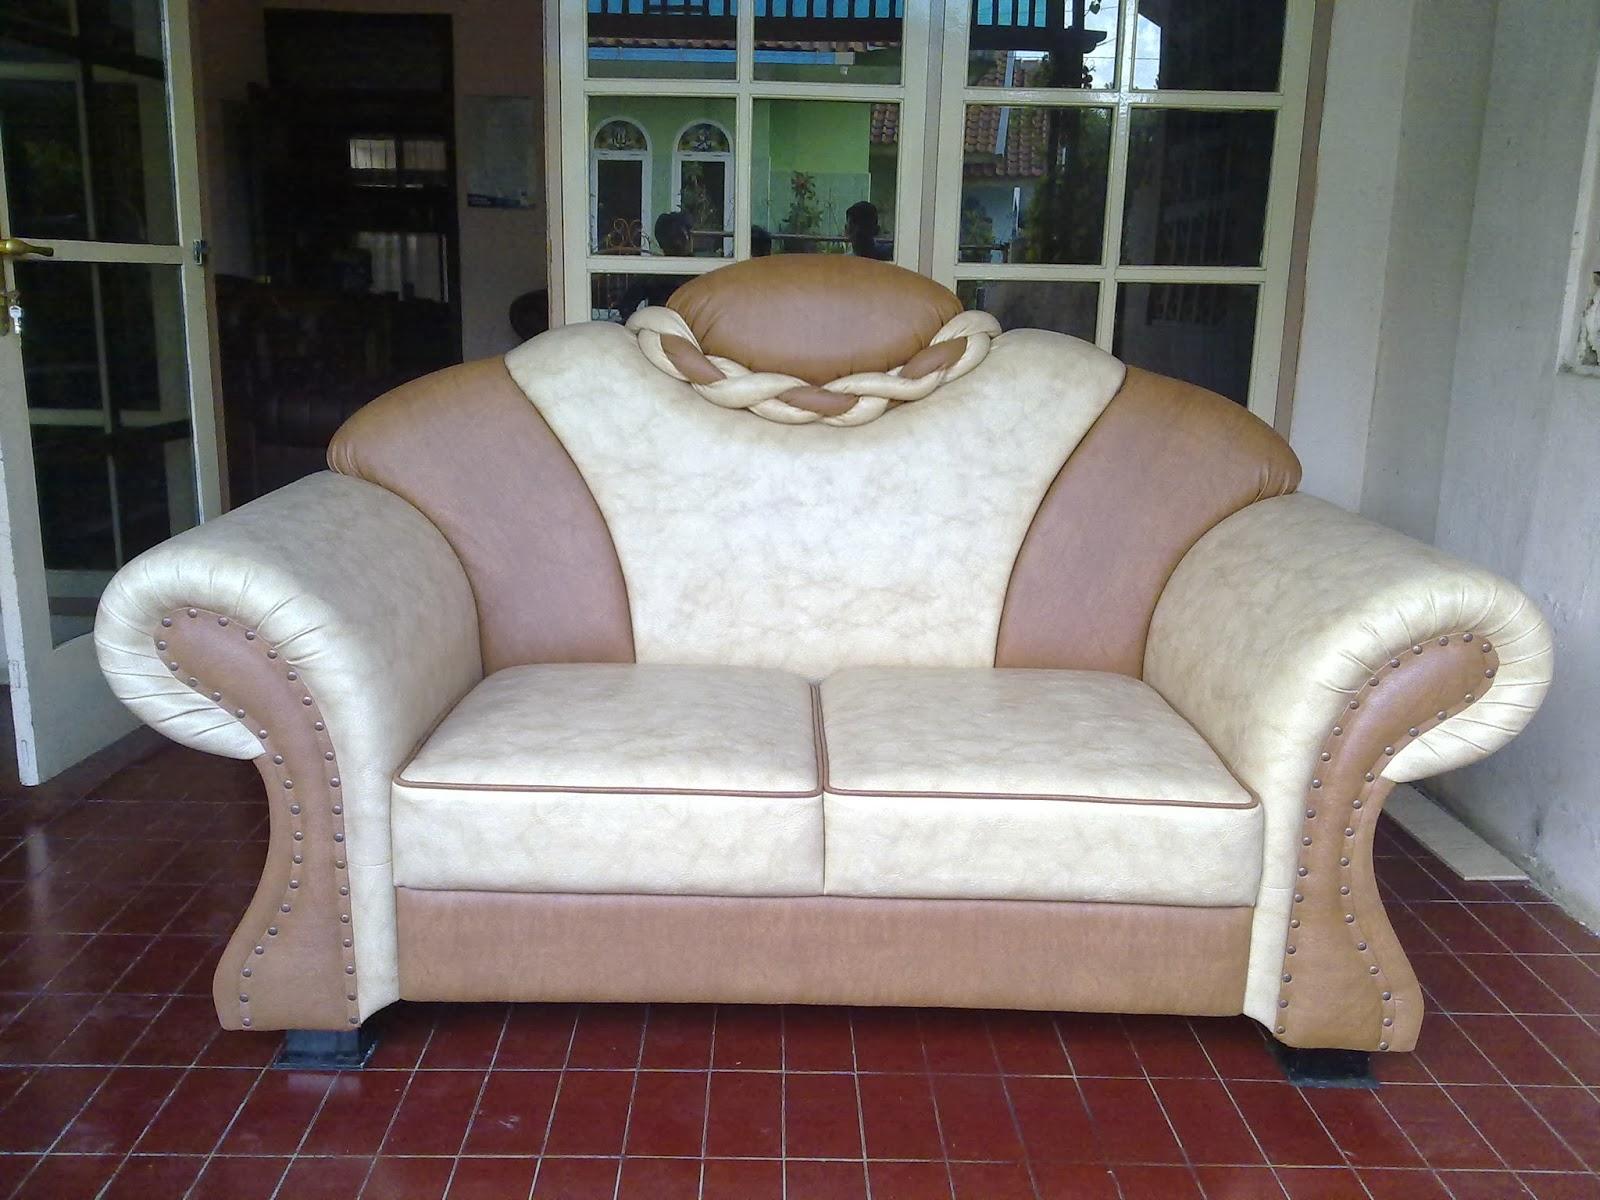 sofa murah di cianjur jackson leather jual bandung hp 0896 1474 9219 pin bbm d9 c9 f3 8c